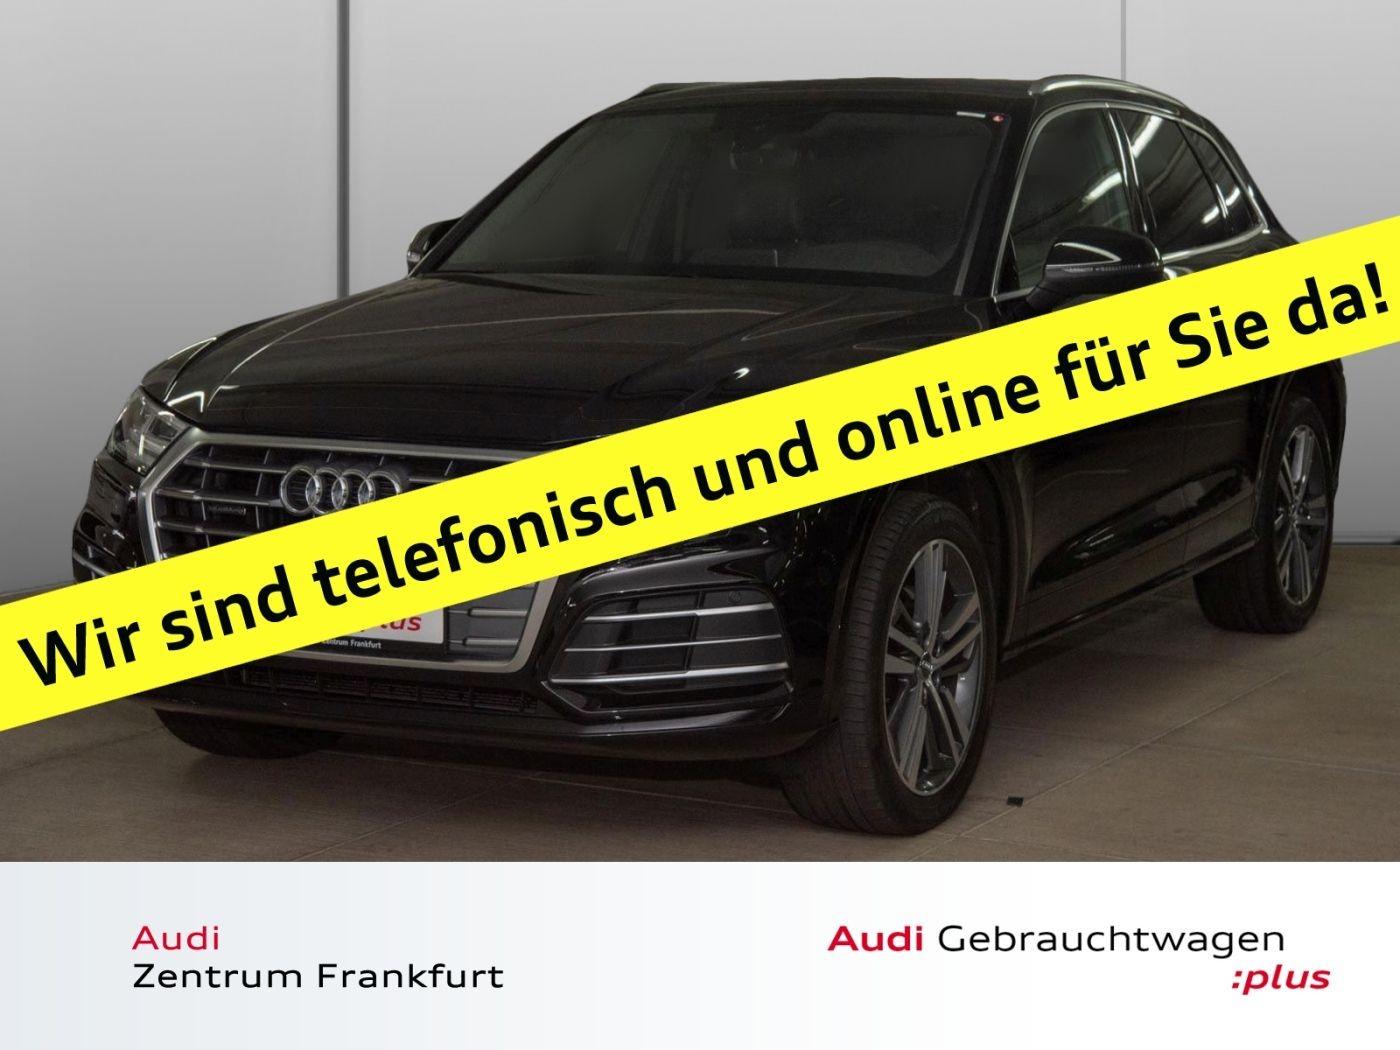 Audi Q5 2.0 TDI quattro S line Navi LED VC Tempomat, Jahr 2018, Diesel